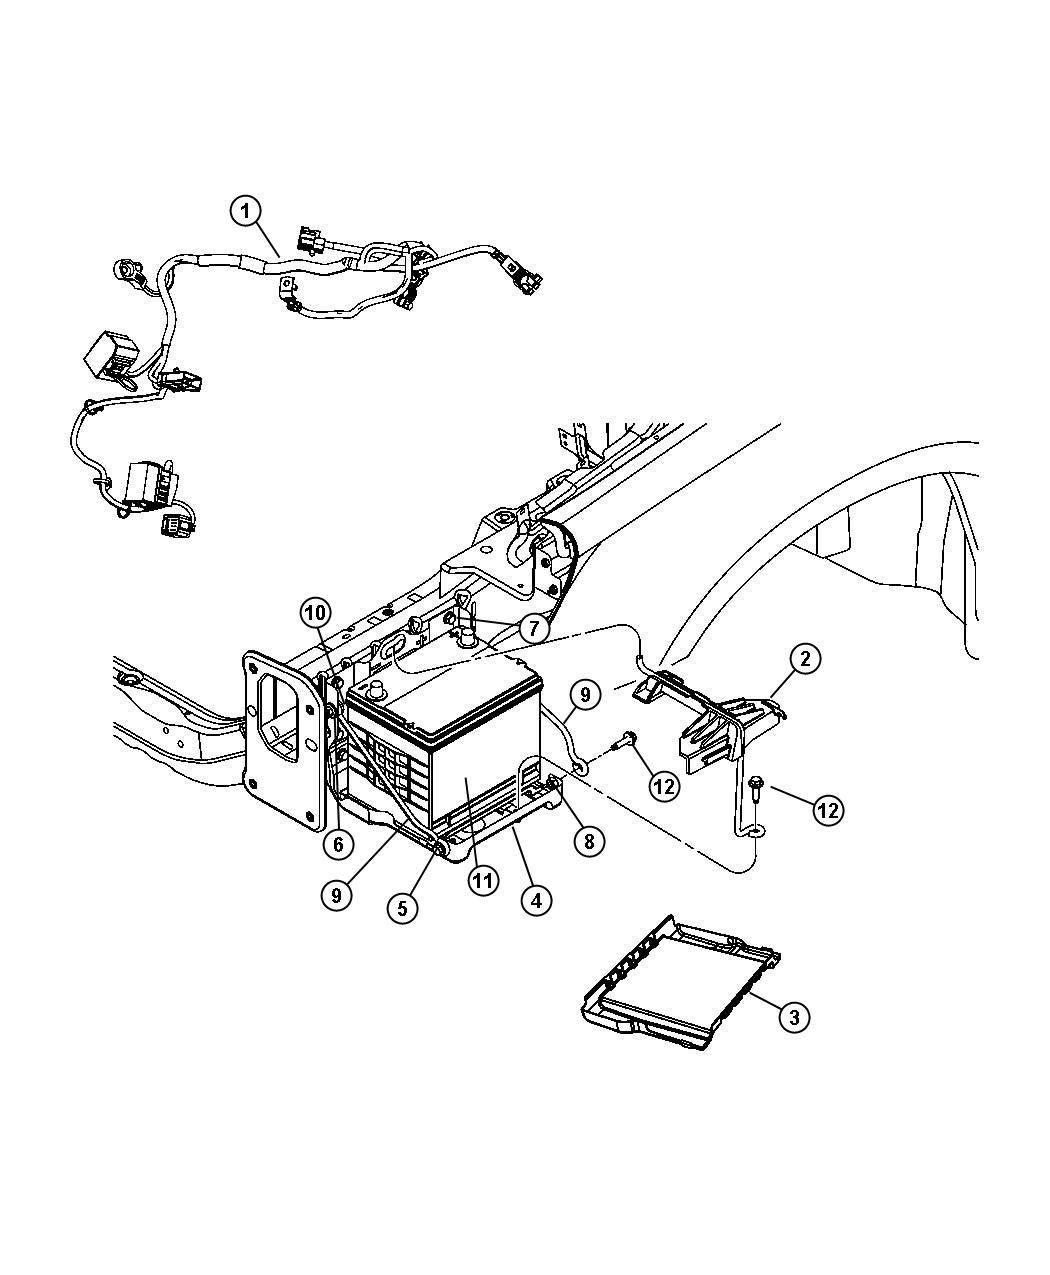 Chrysler Sebring Wiring Battery Contains Jump Start